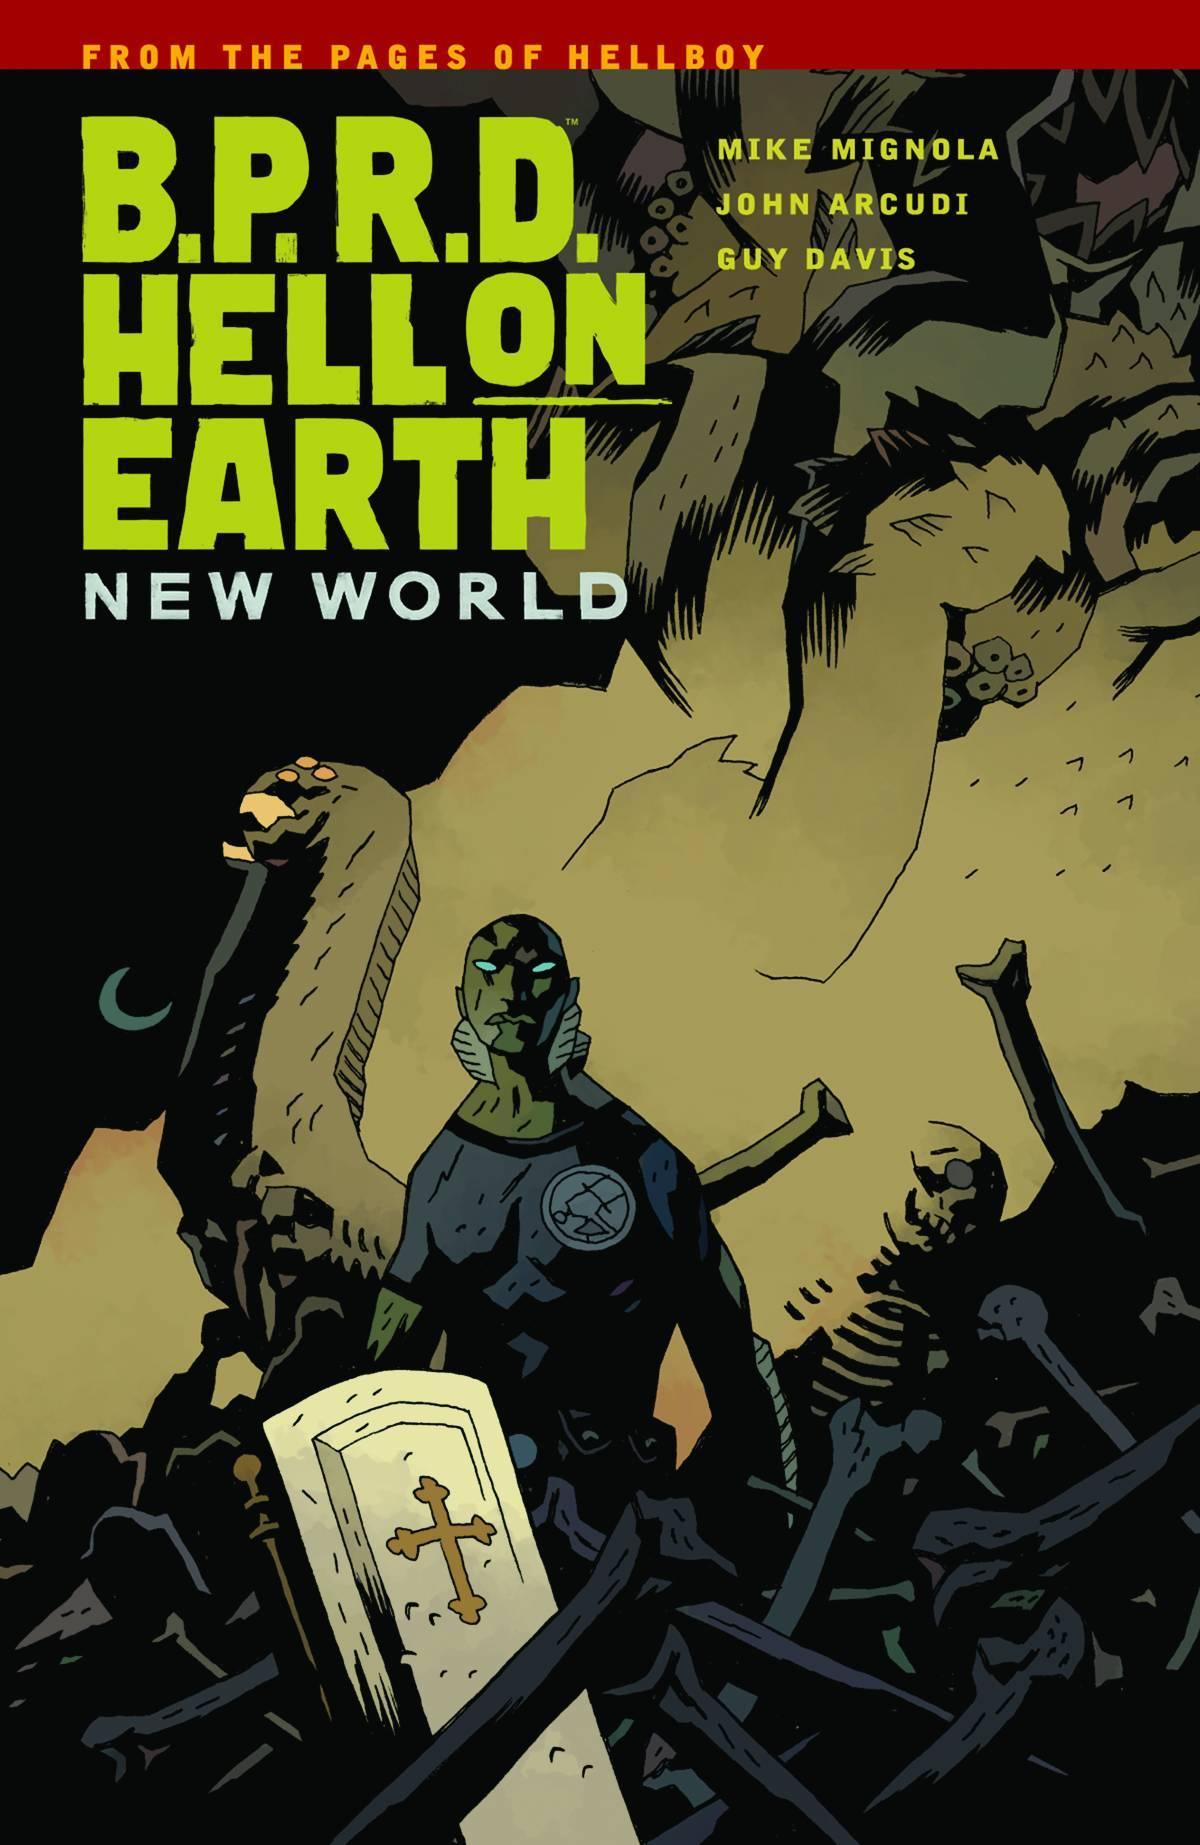 BPRD Hell On Earth Vol 01 New World